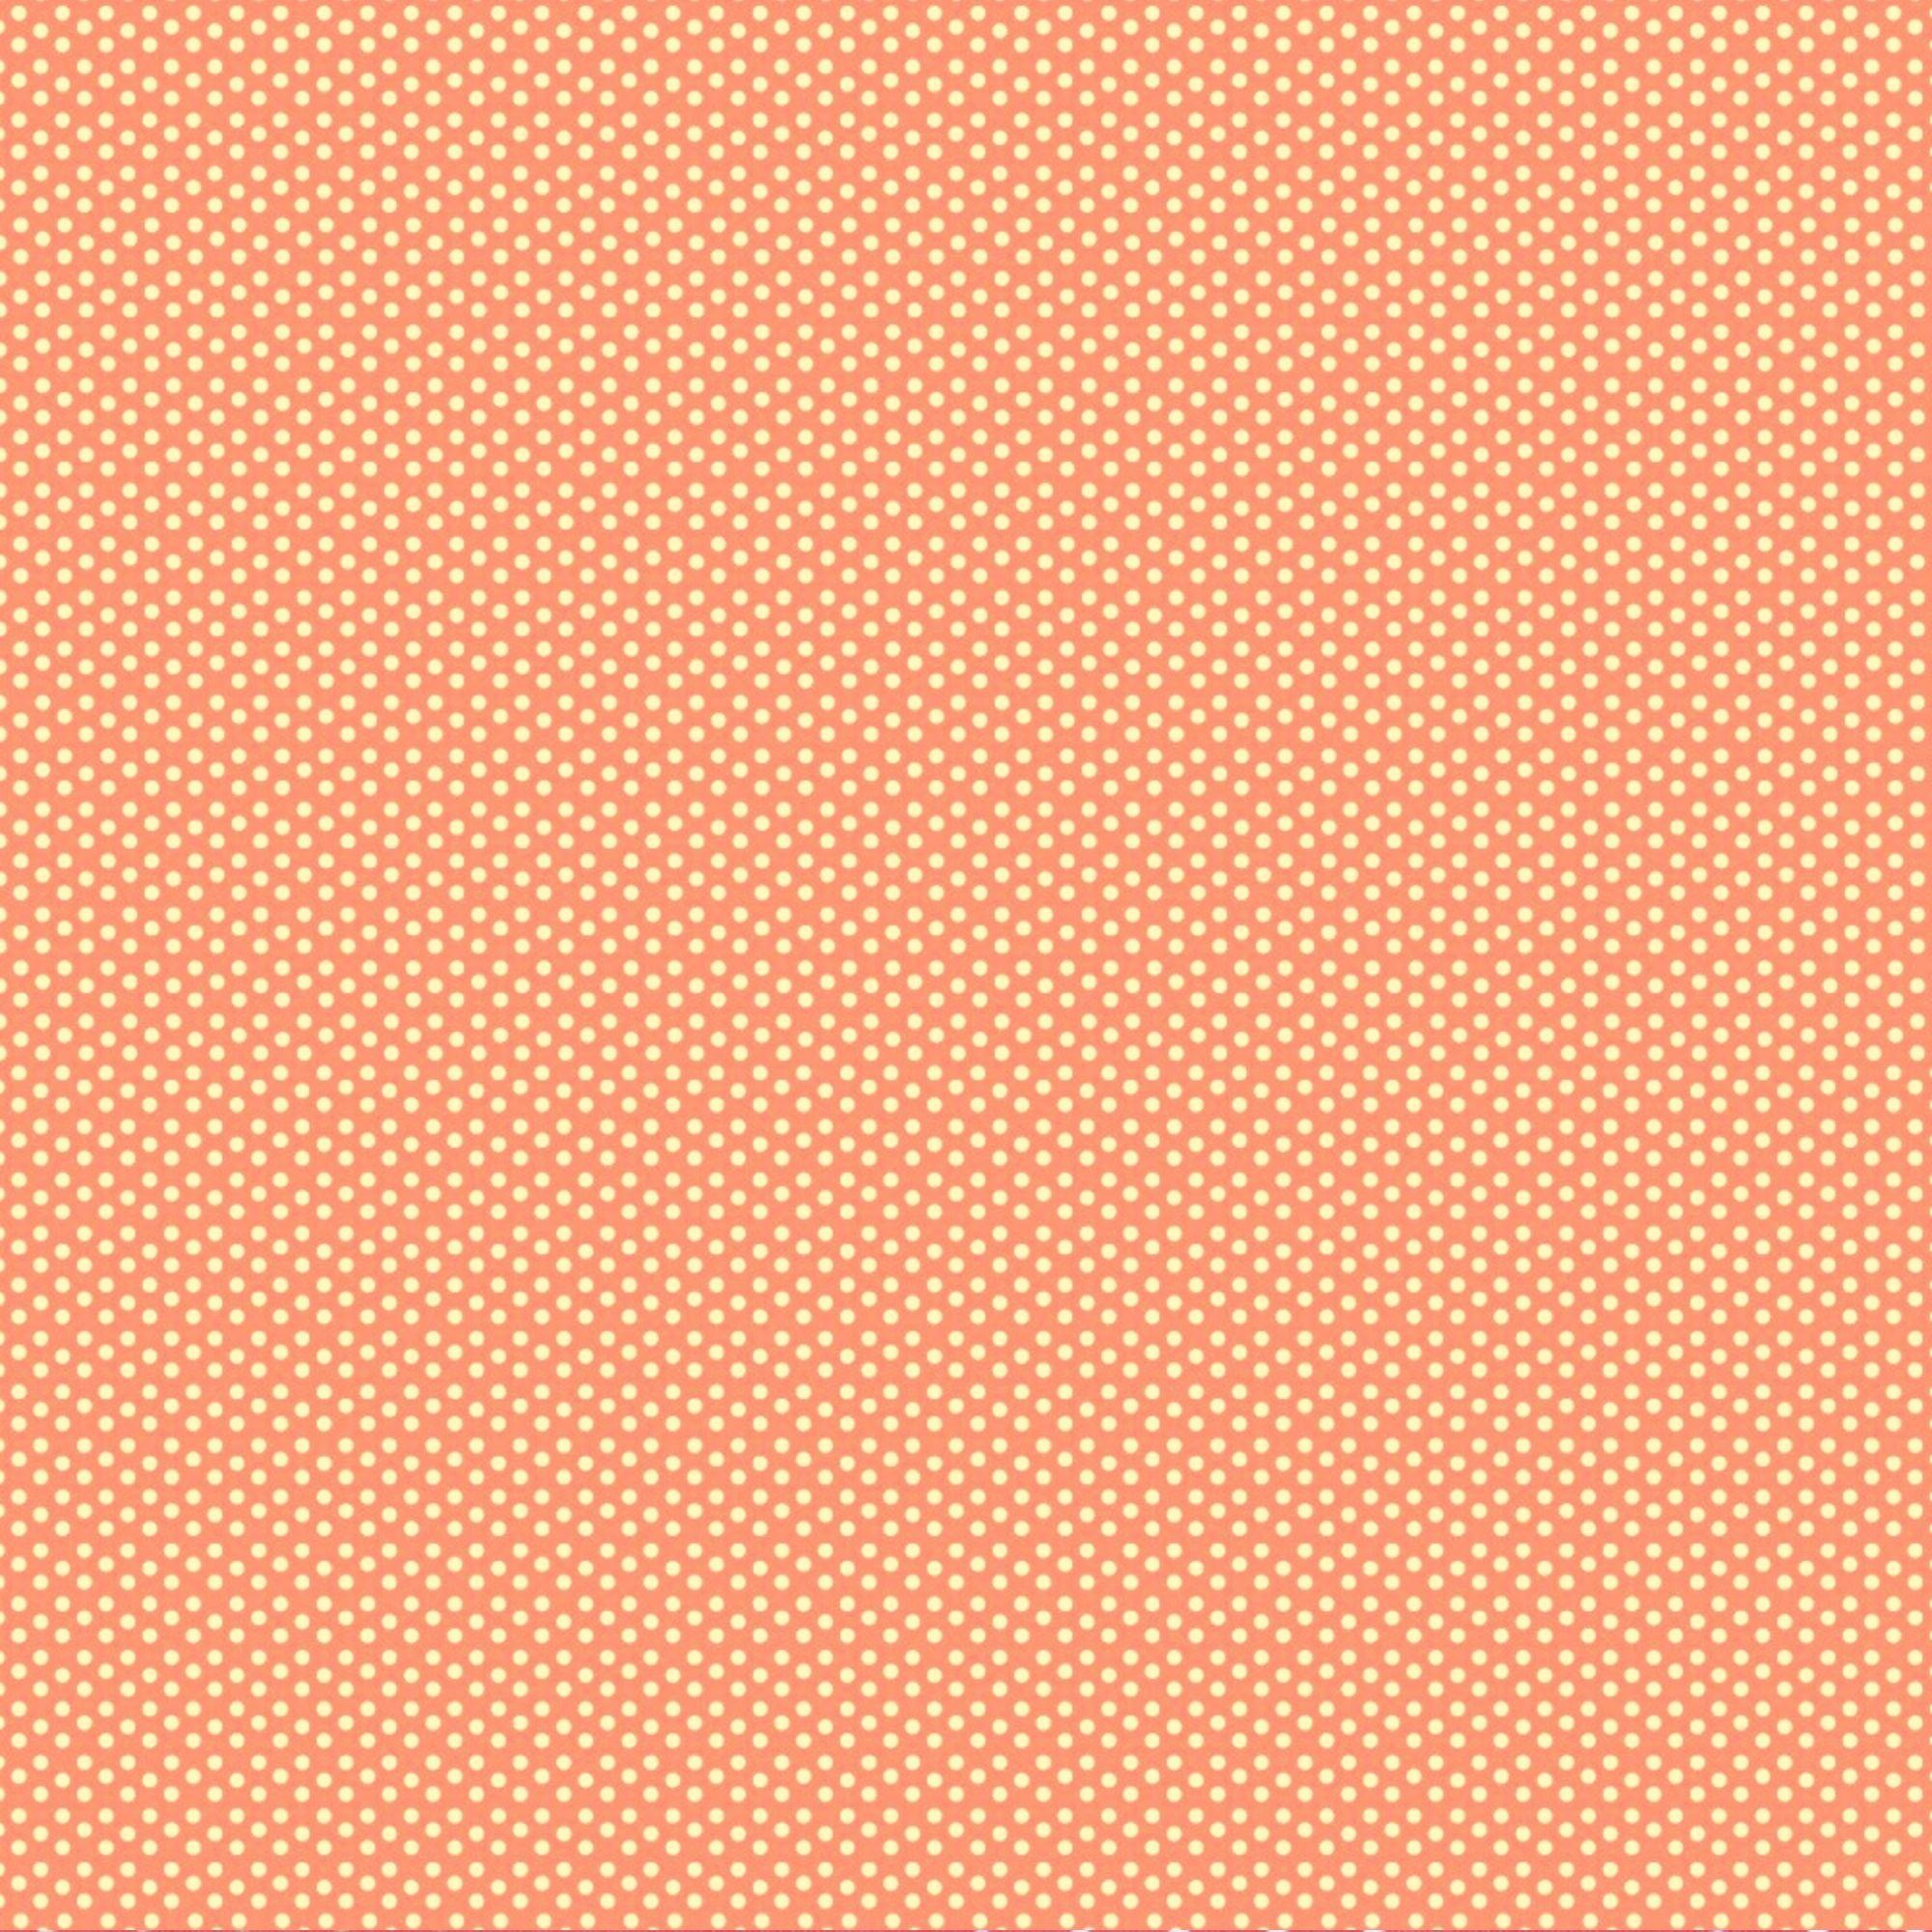 Tecido Tricoline Micro Poá Branco - Fundo Telha - Preço de 50 cm x 150 cm